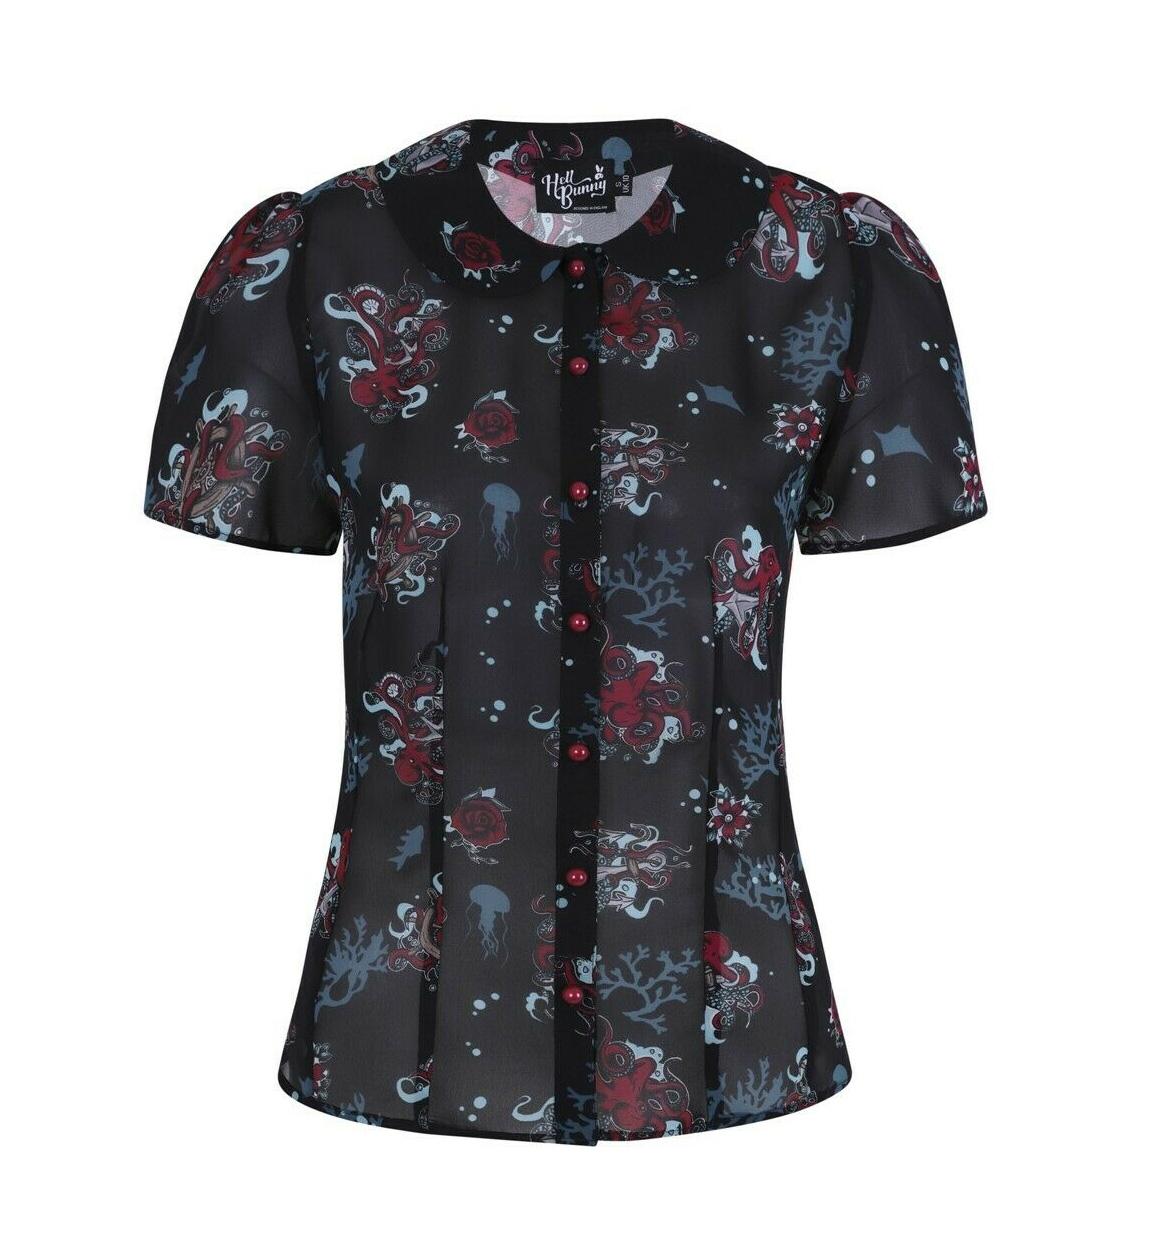 Hell-Bunny-50s-Shirt-Top-Black-Ocean-Octopus-Roses-POSEIDON-Blouse-All-Sizes thumbnail 5